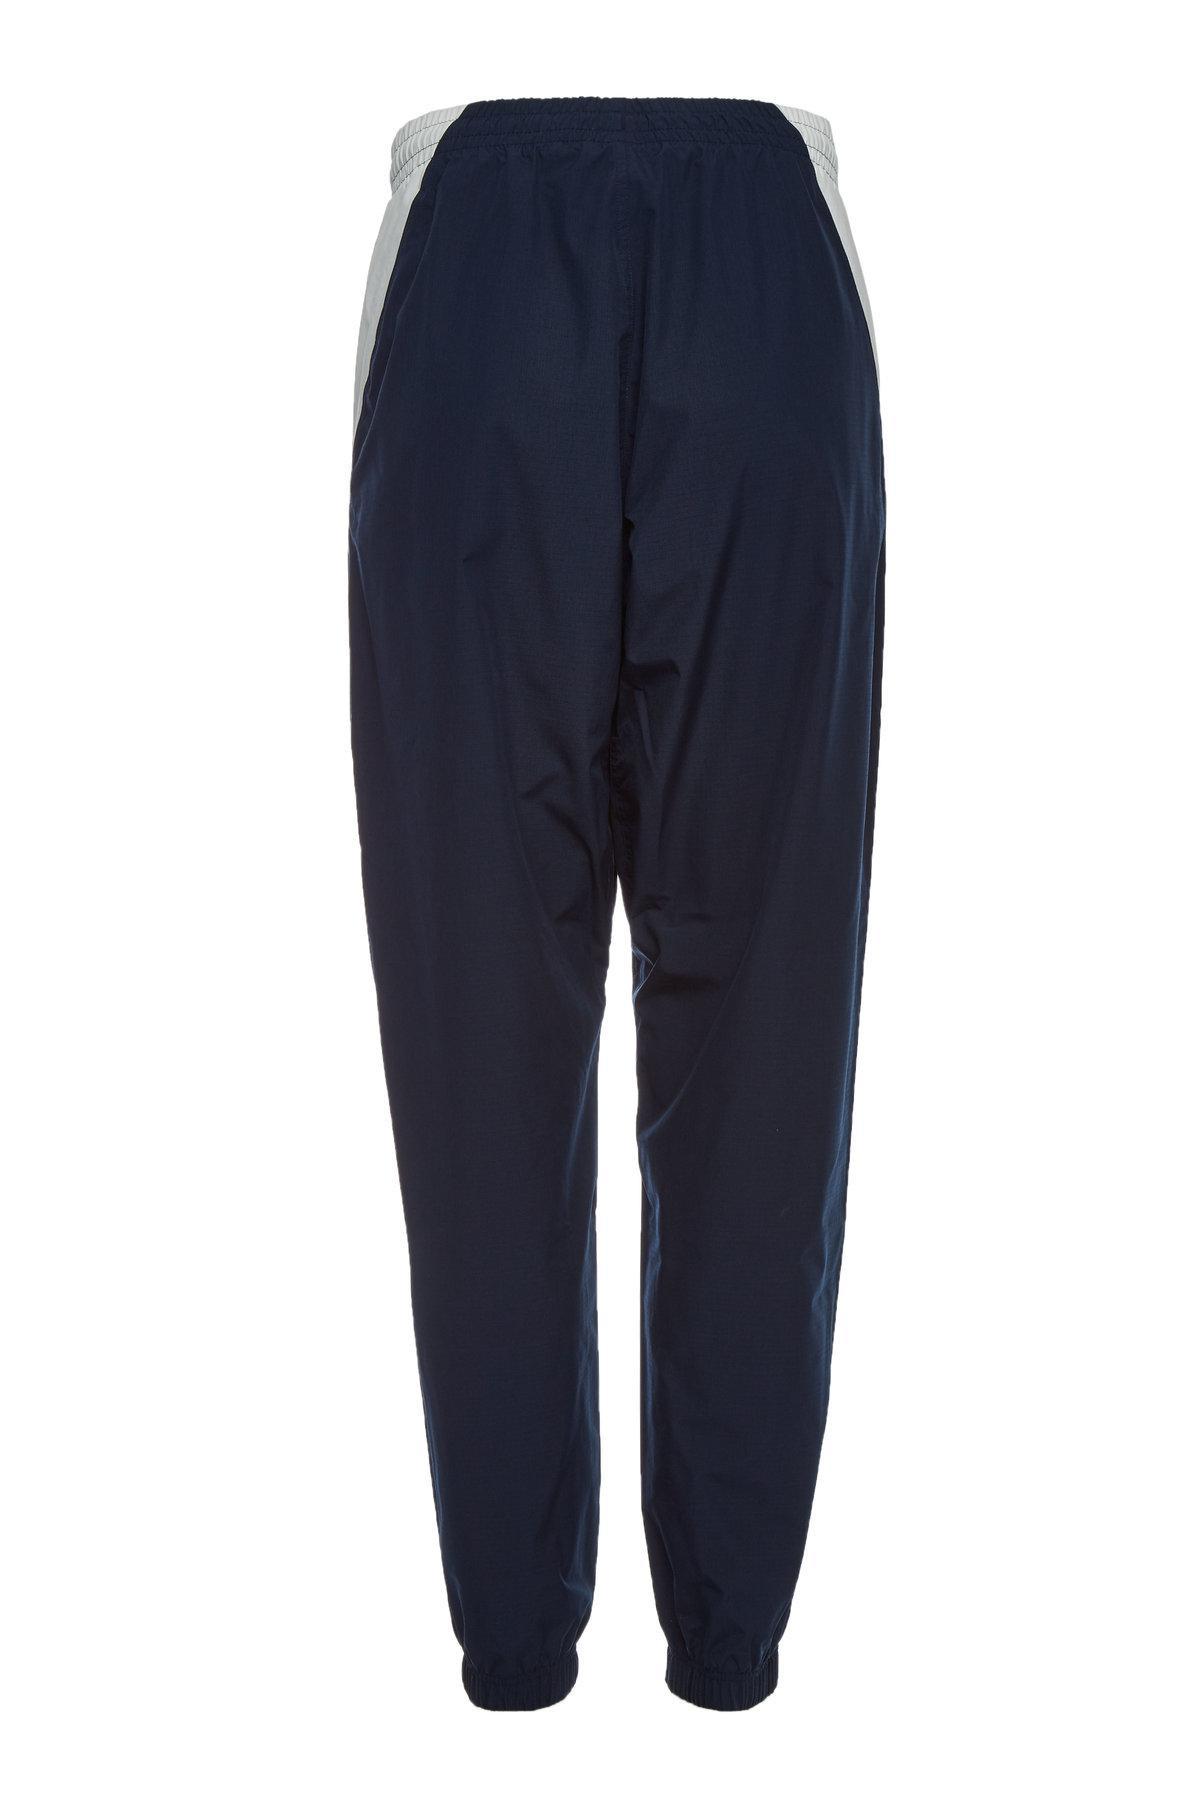 bea6d68357d43 Adidas Originals - Blue Pantalon de jogging EQT WARM UP for Men - Lyst.  Afficher en plein écran